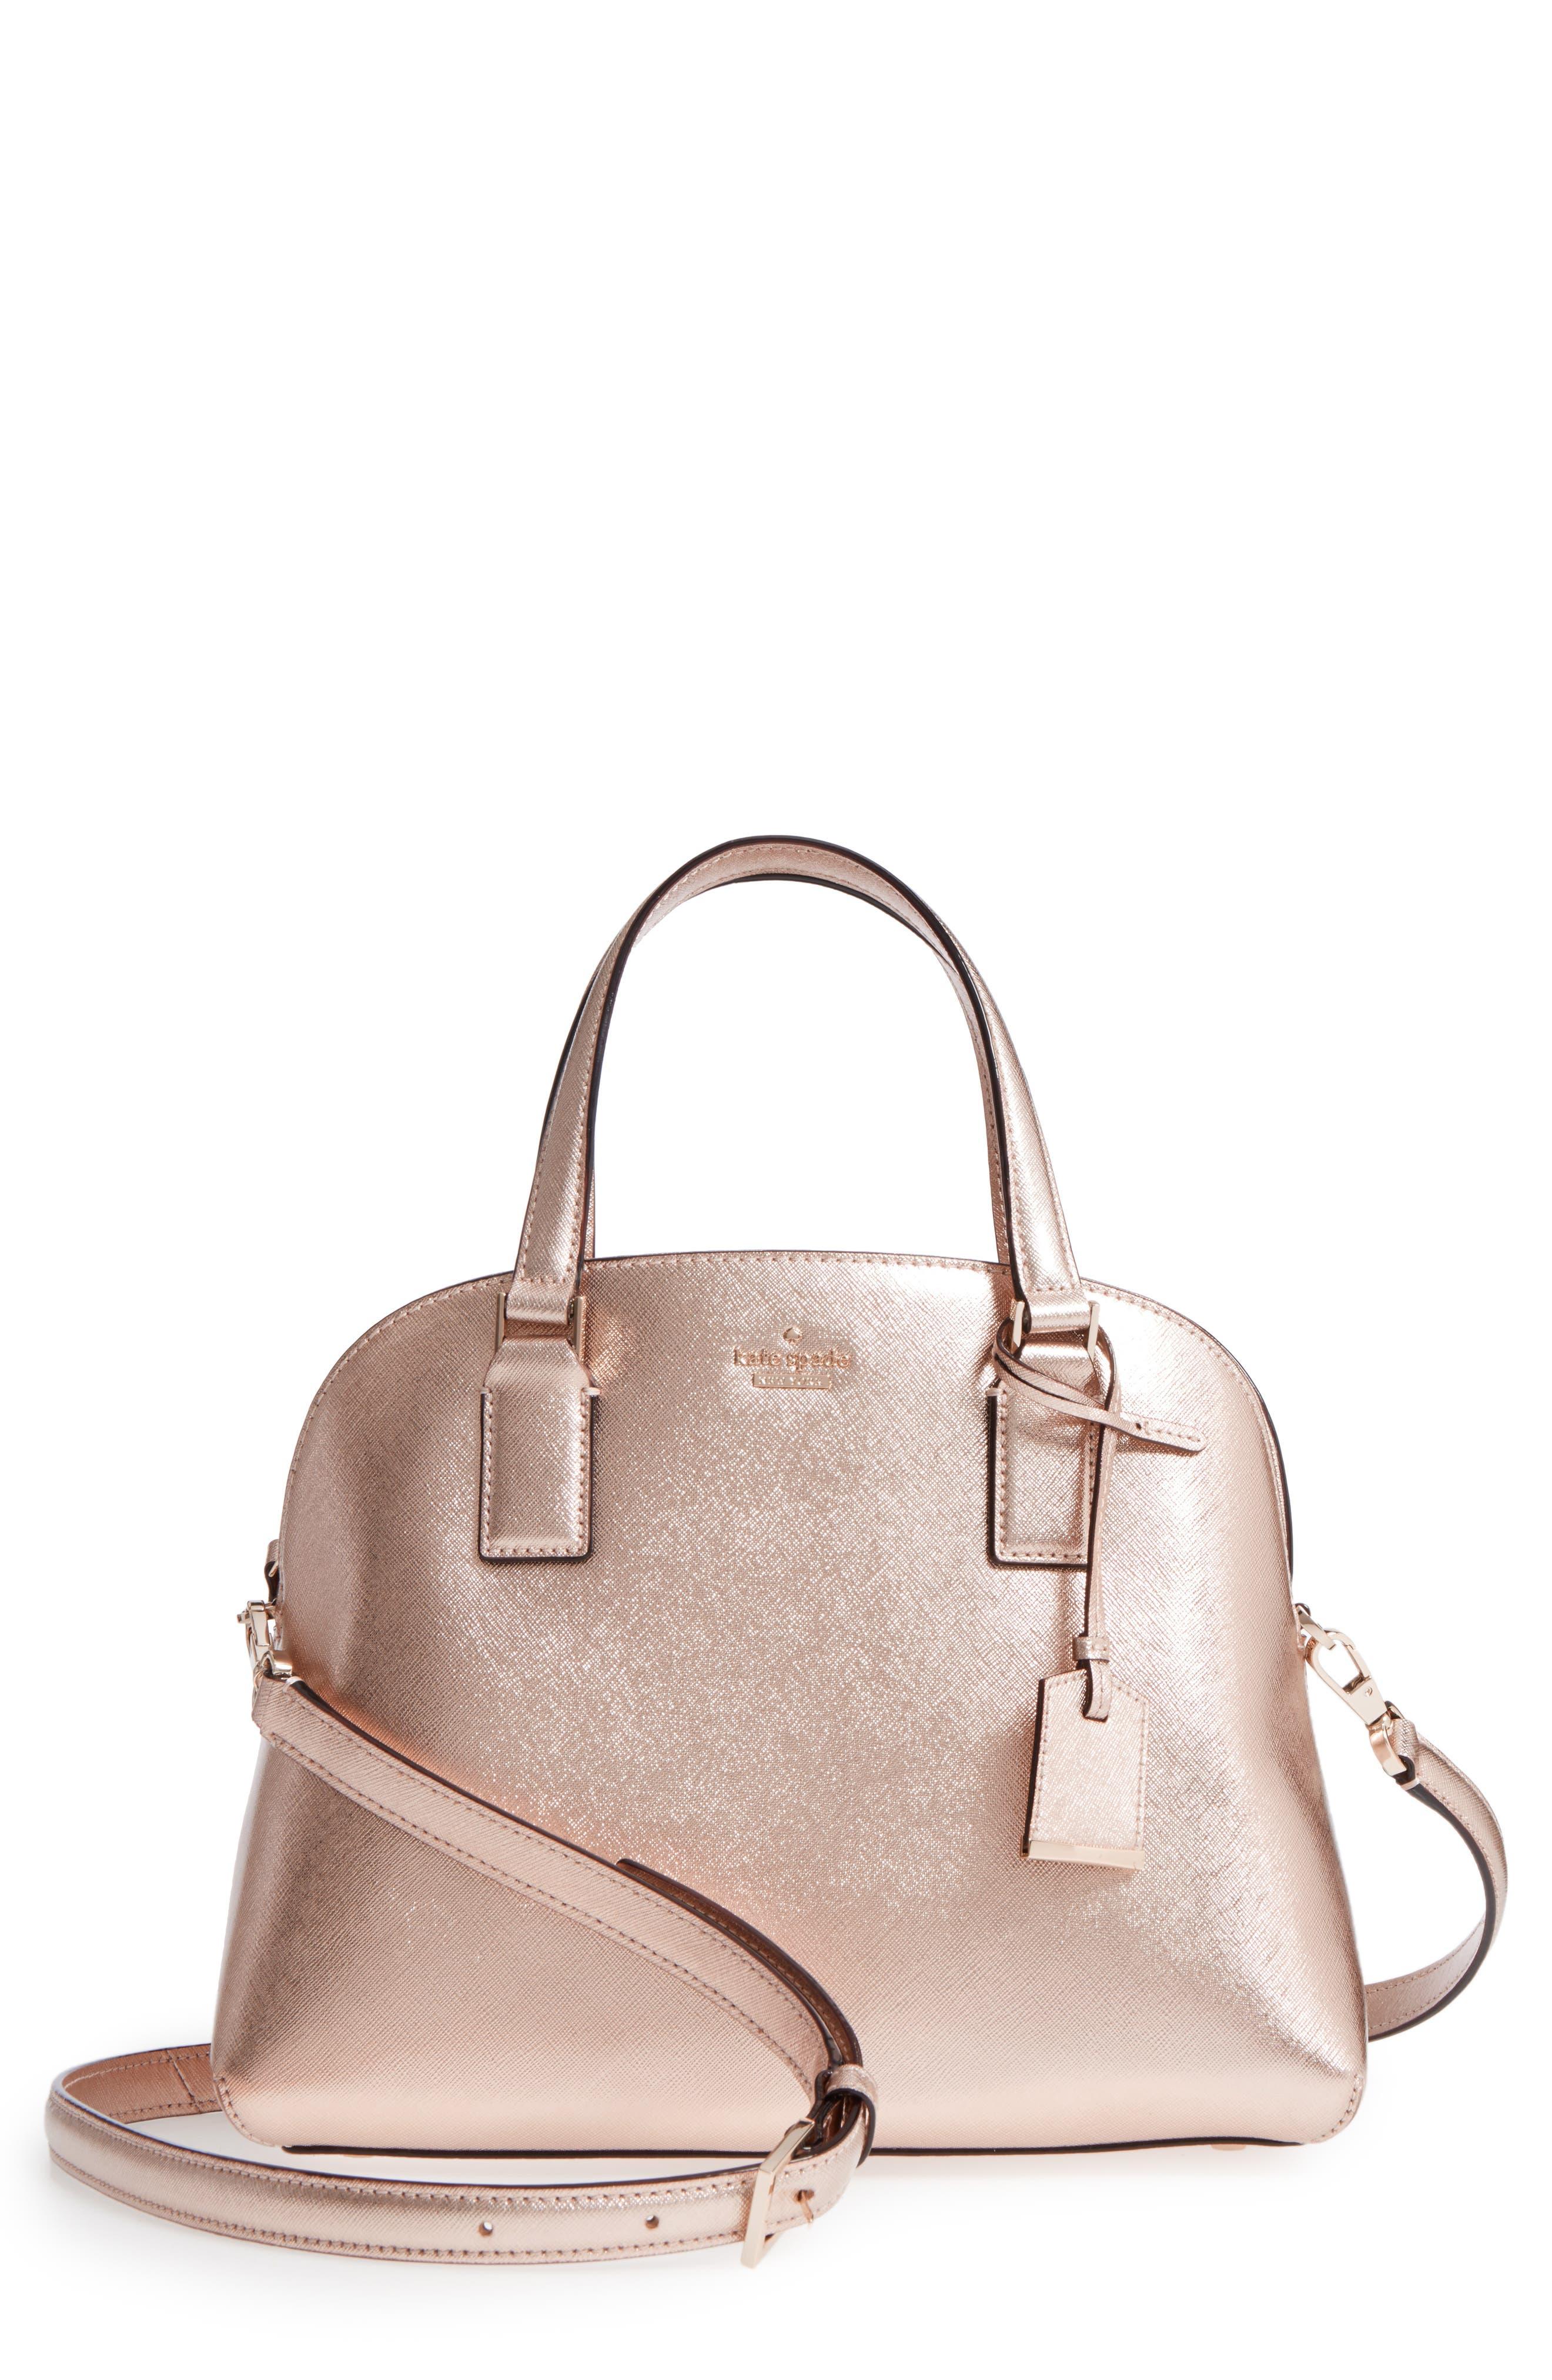 cameron street - lottie leather satchel,                             Main thumbnail 1, color,                             650